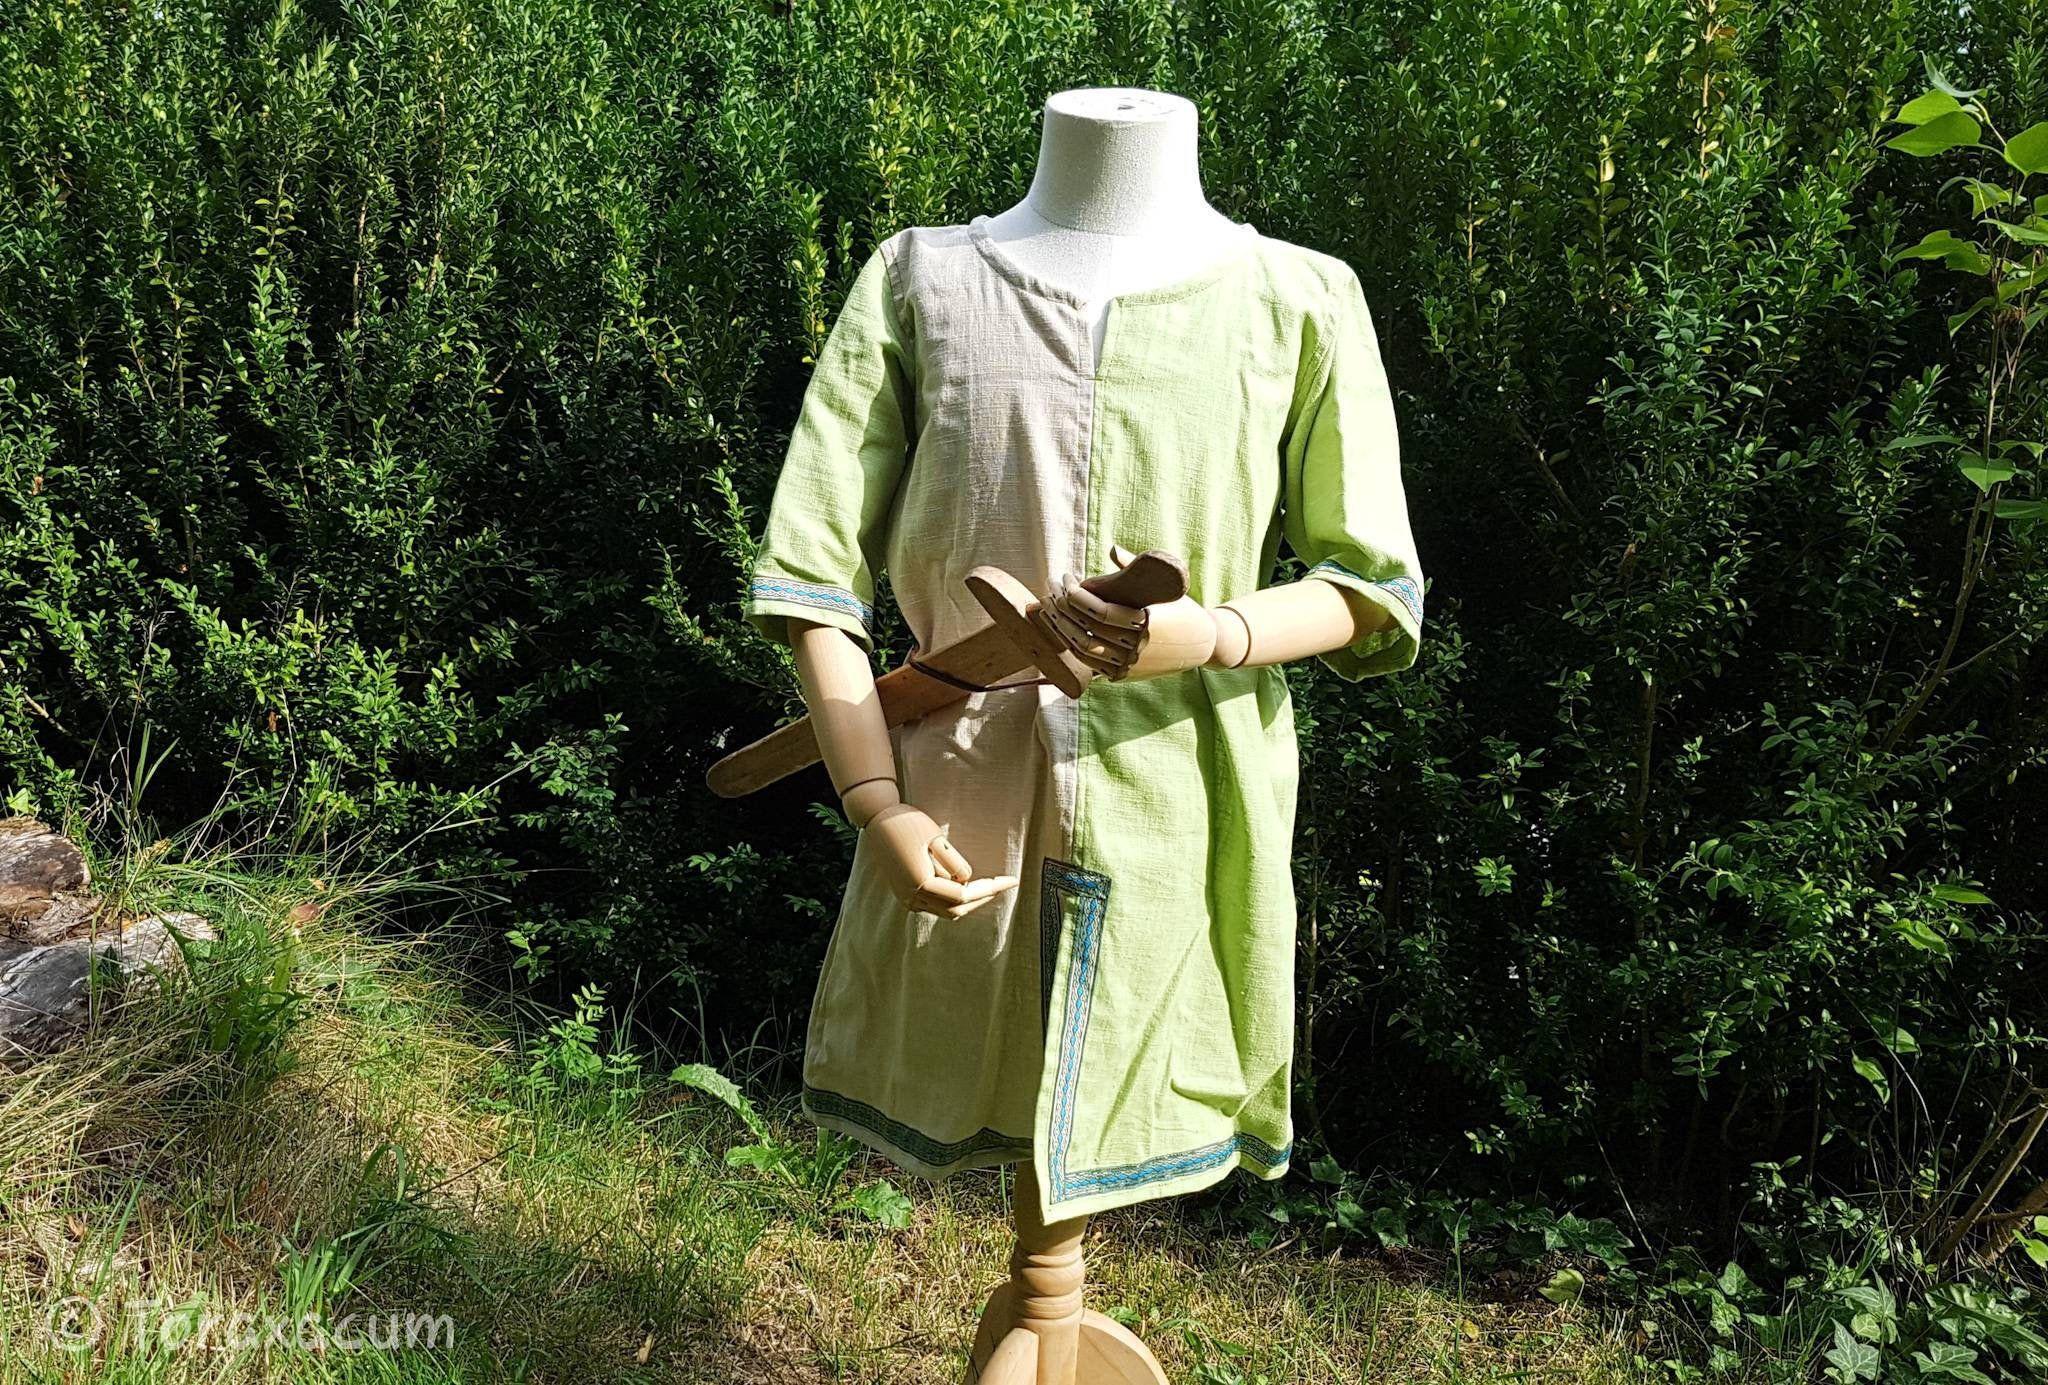 Leg Wrap Wool Brown Kids Calf Wrap Viking Ranger Costume Cosplay Medieval Boys SCA Toraxacum LARP